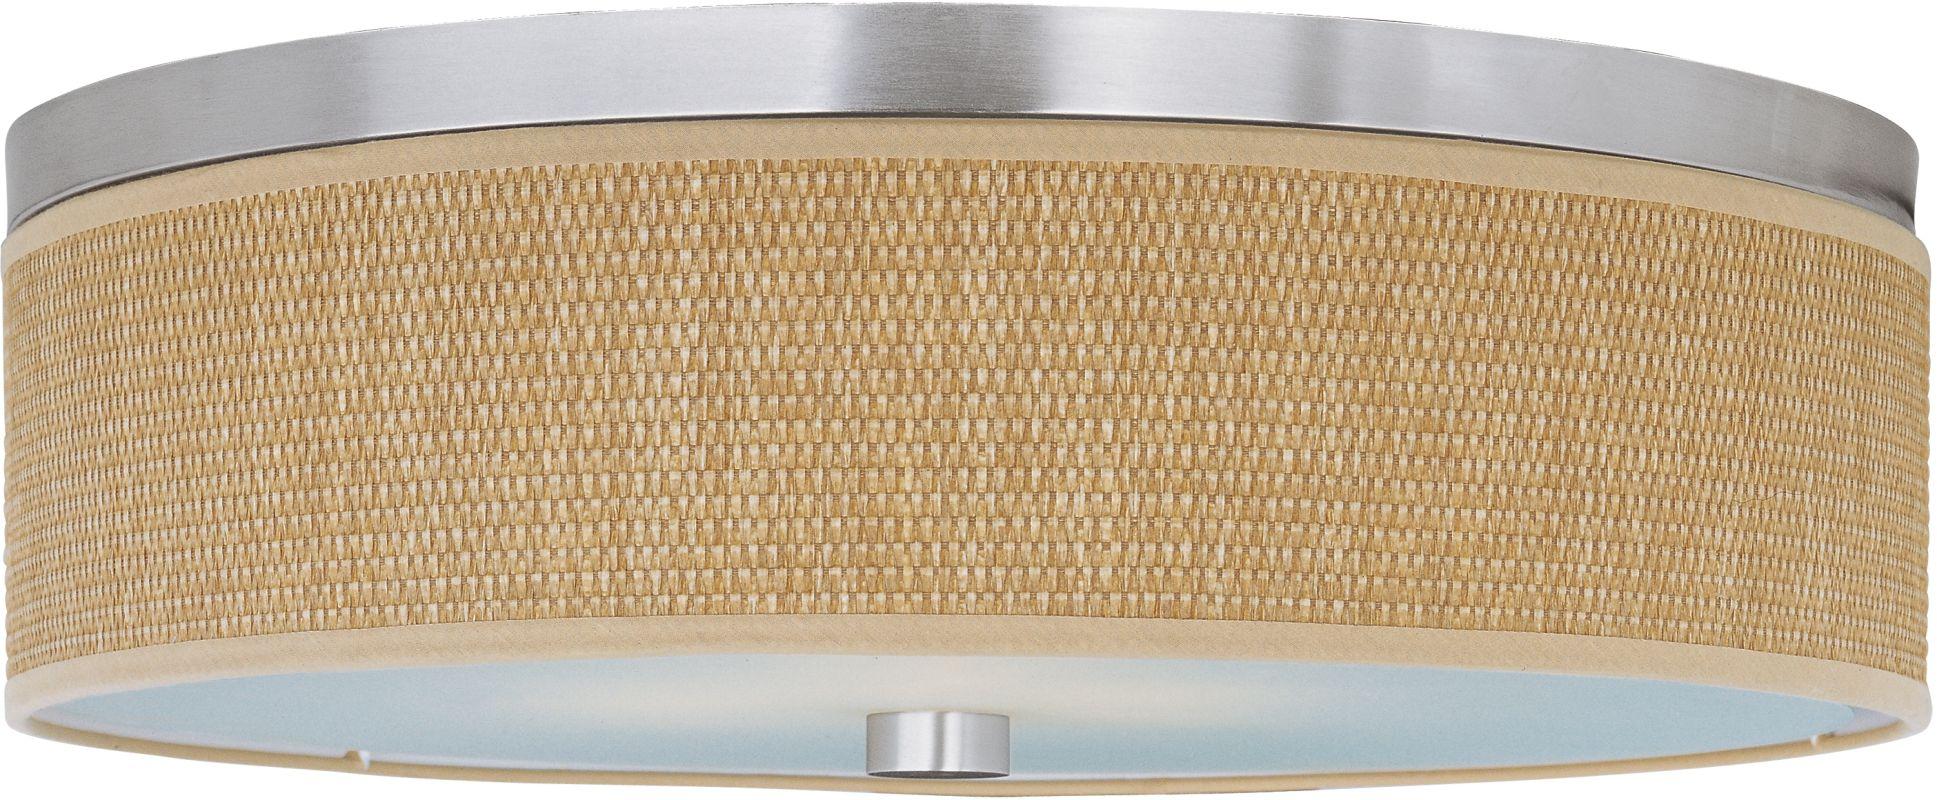 ET2 E95004-101SN Satin Nickel Contemporary Elements Ceiling Light